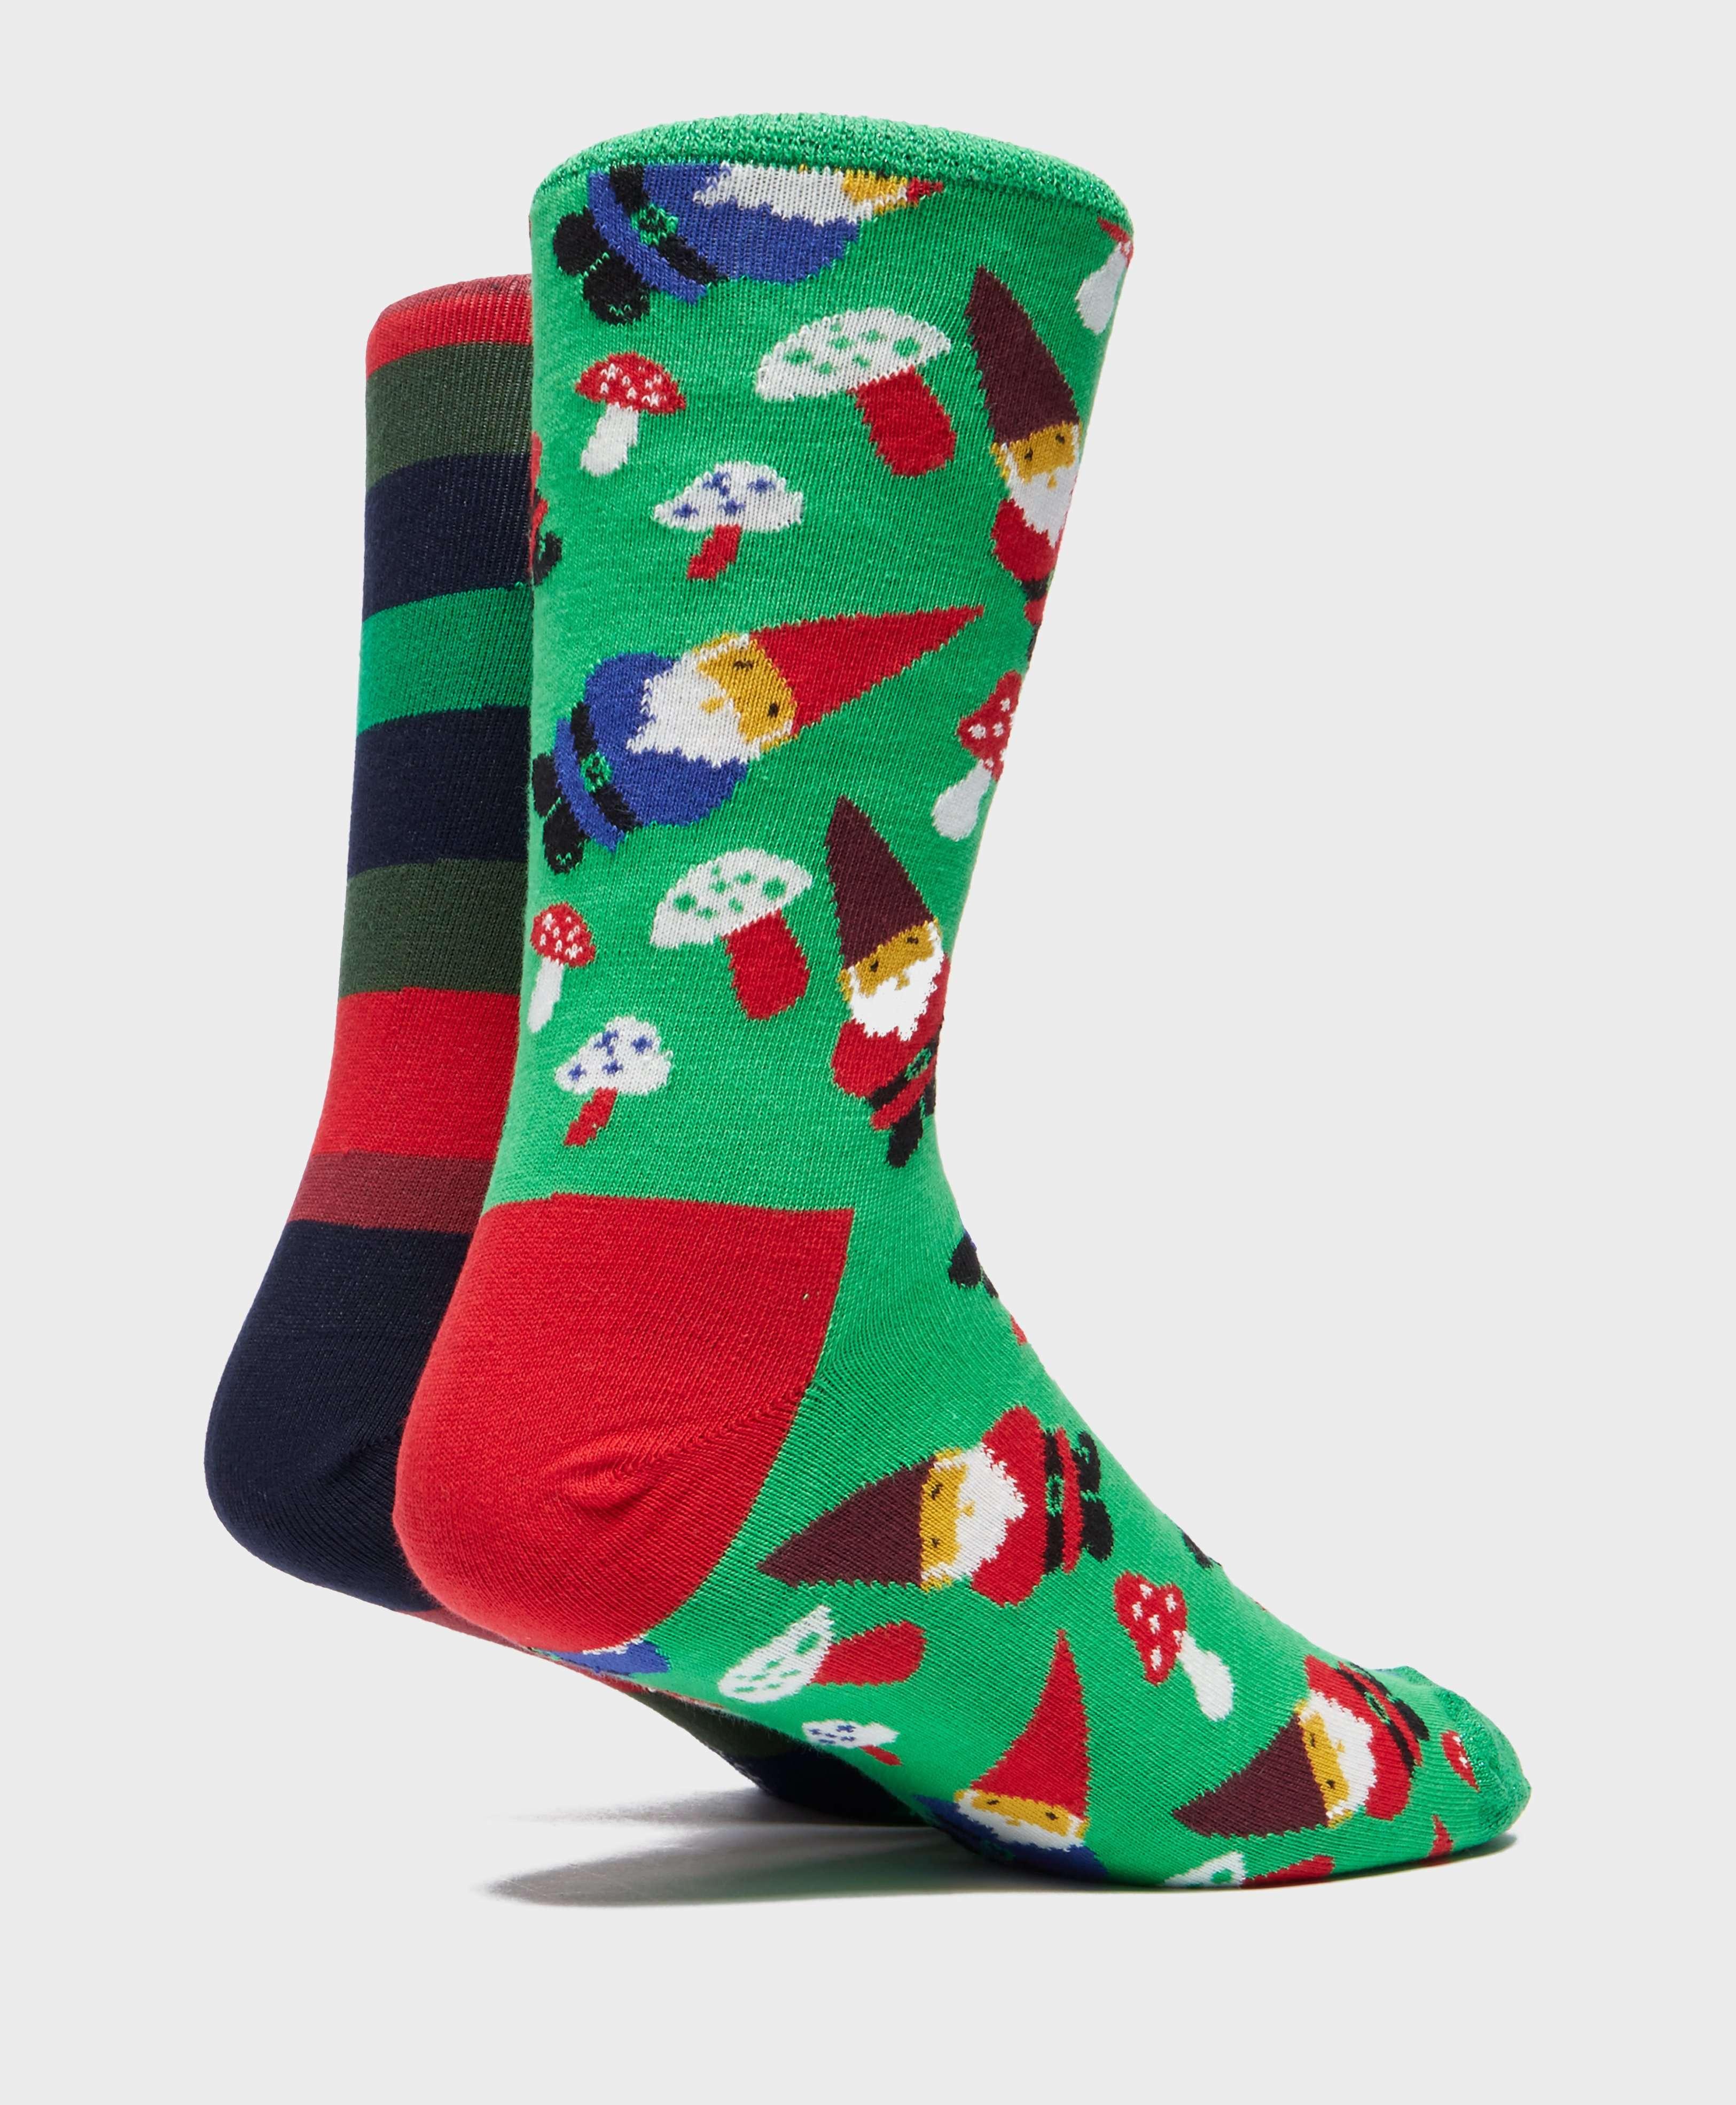 b577517dd Buy happy socks 2. Shop every store on the internet via PricePi.com ...